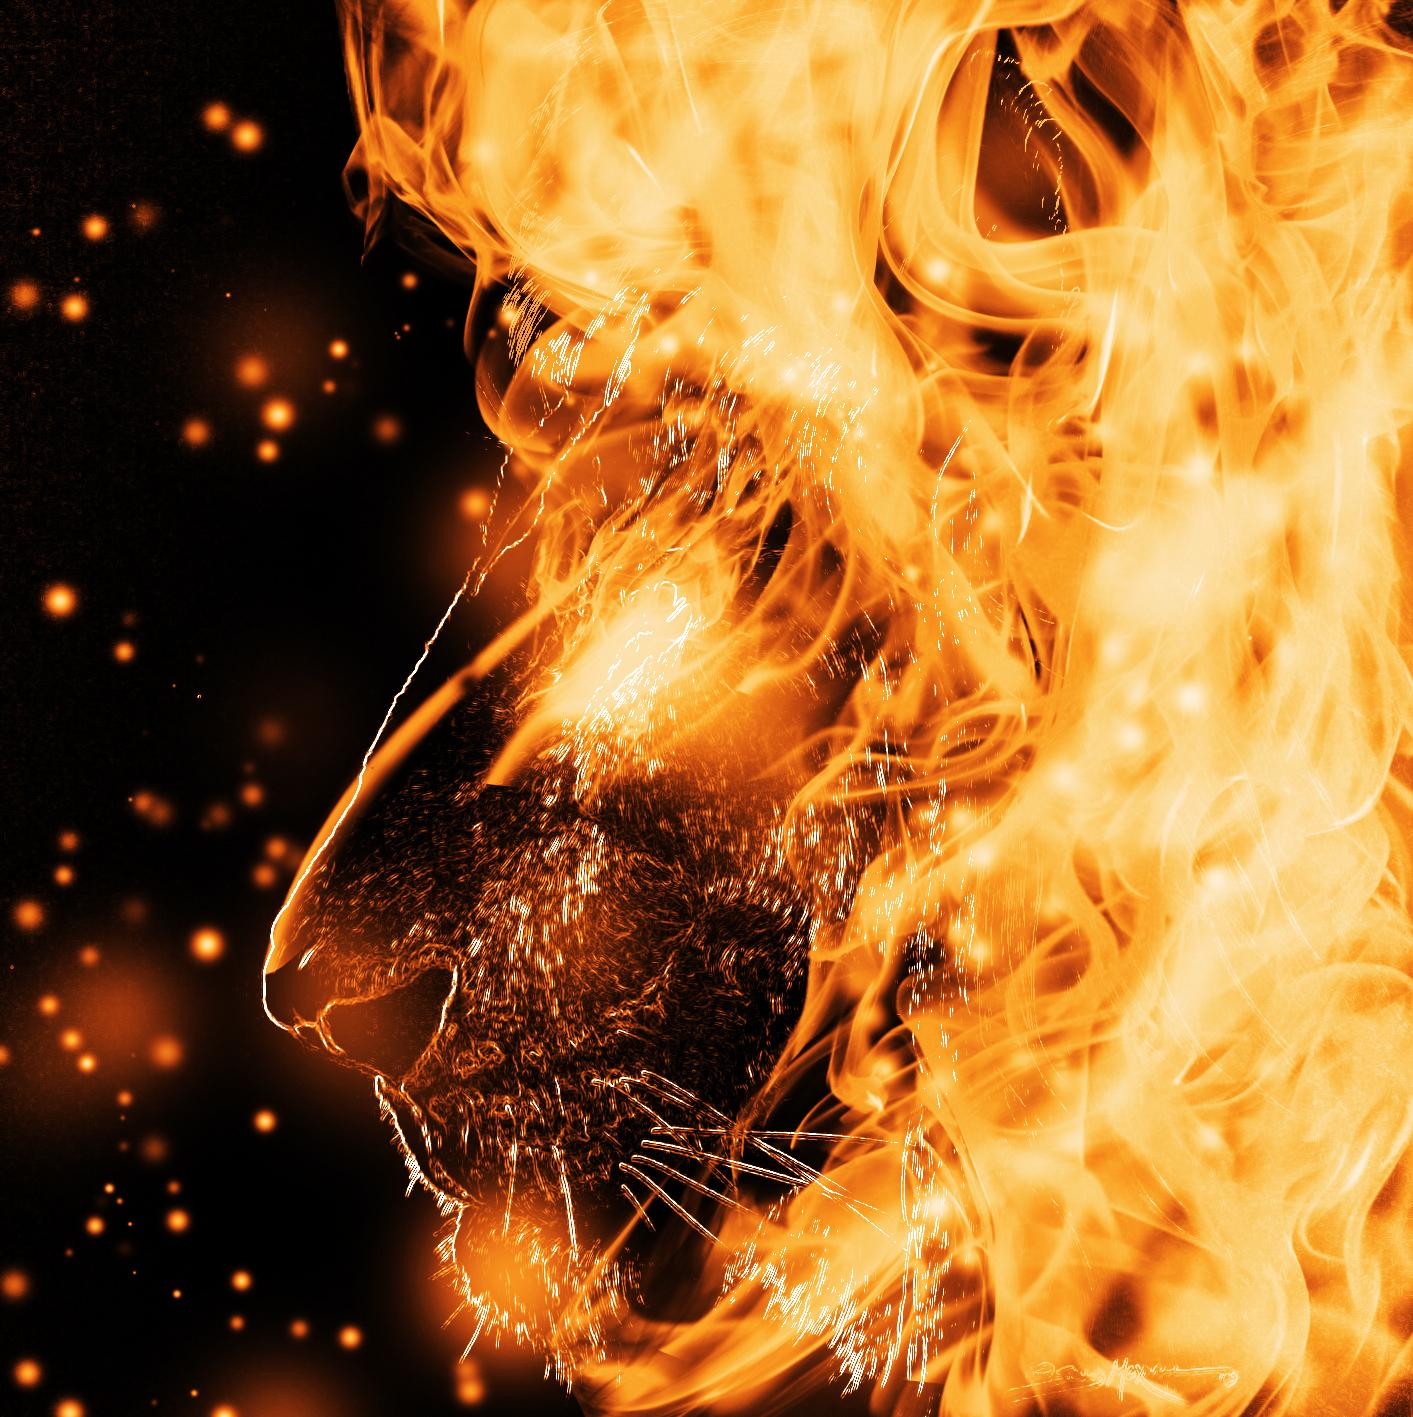 fire lion by Capitan-Mark-Antony